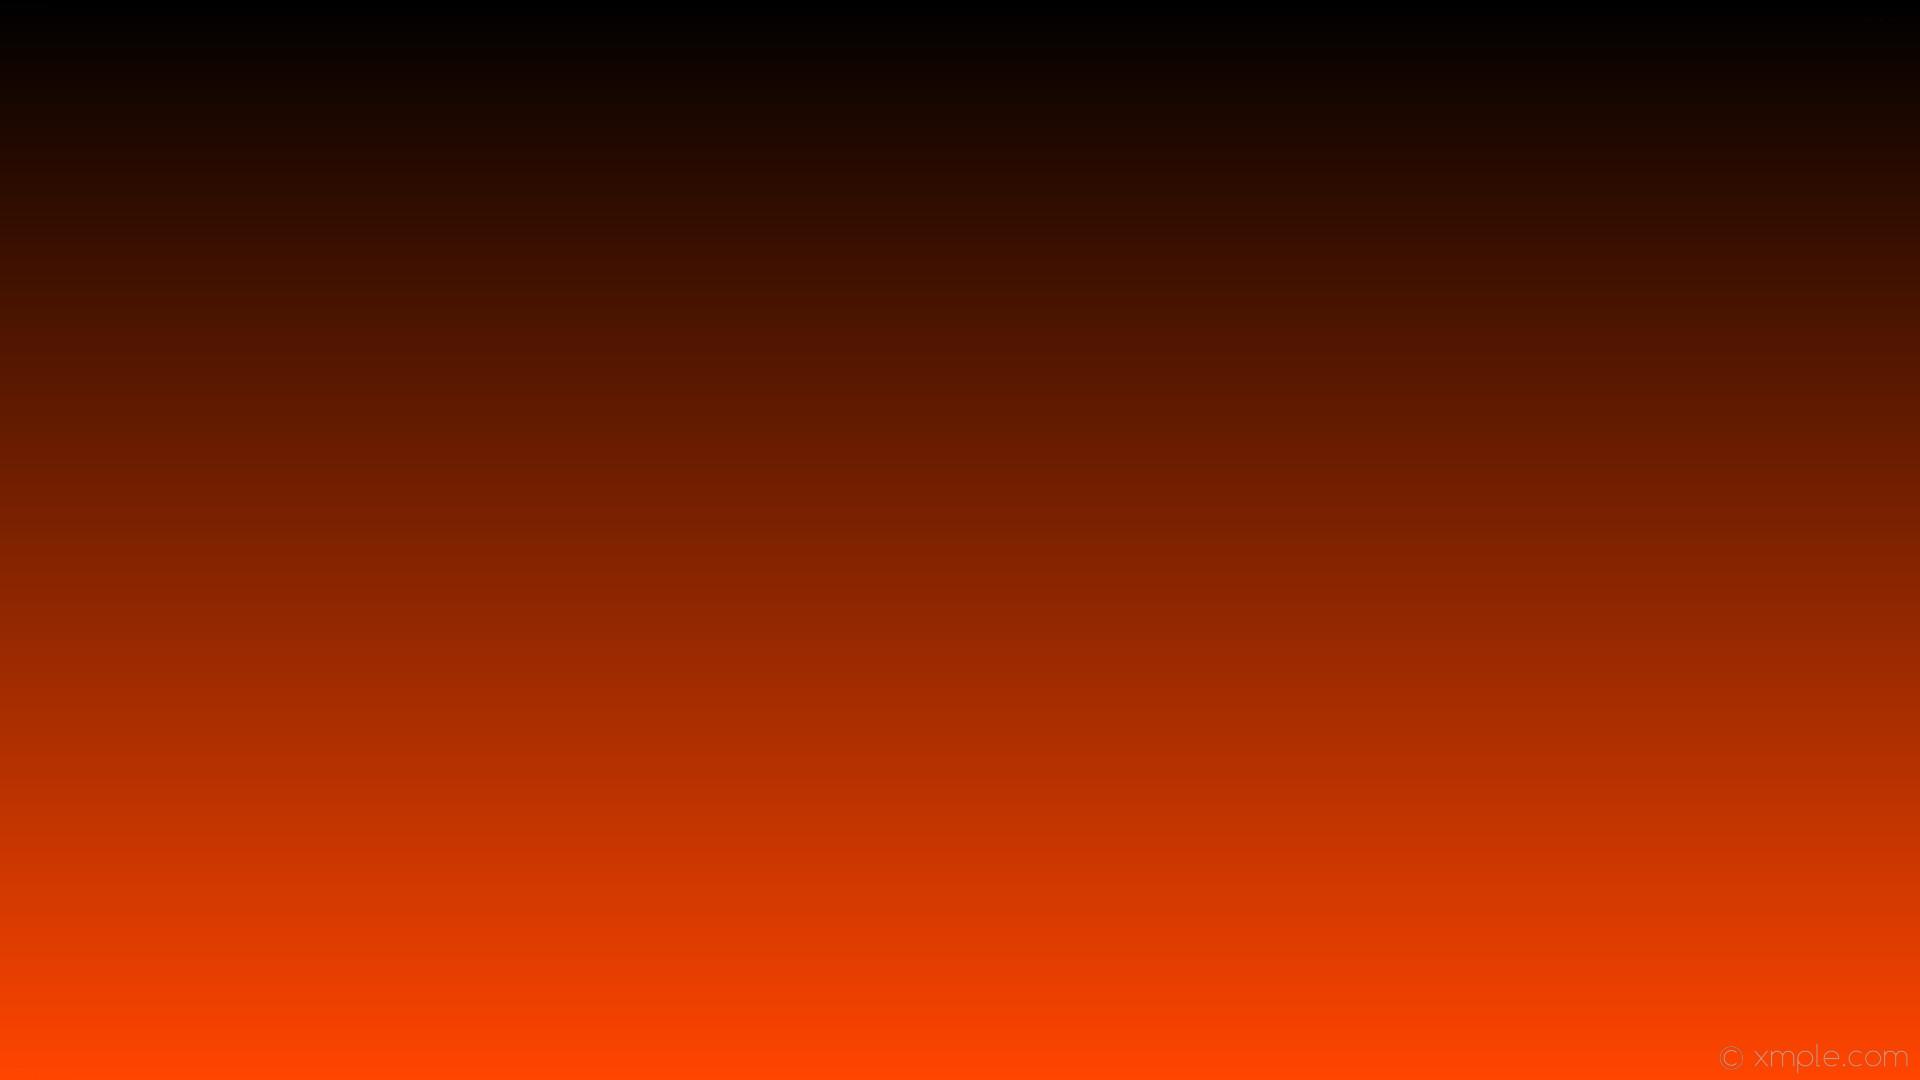 wallpaper linear gradient orange black orangered #ff4500 #000000 270°